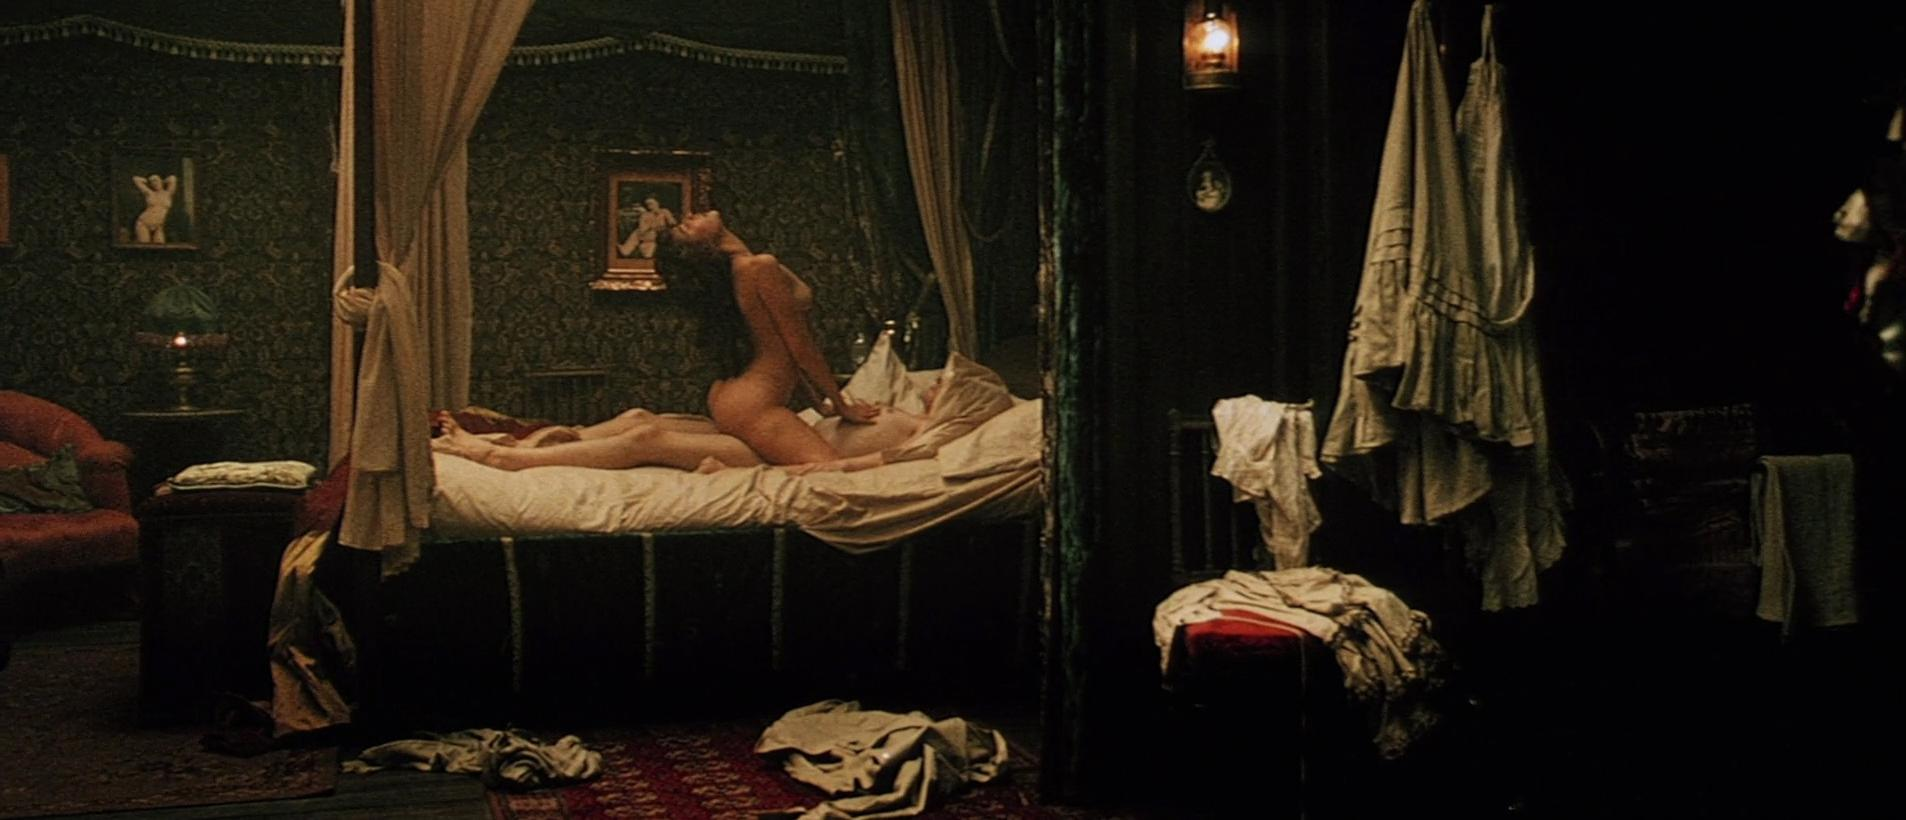 Vahina Giocante nude - Blueberry (2004)